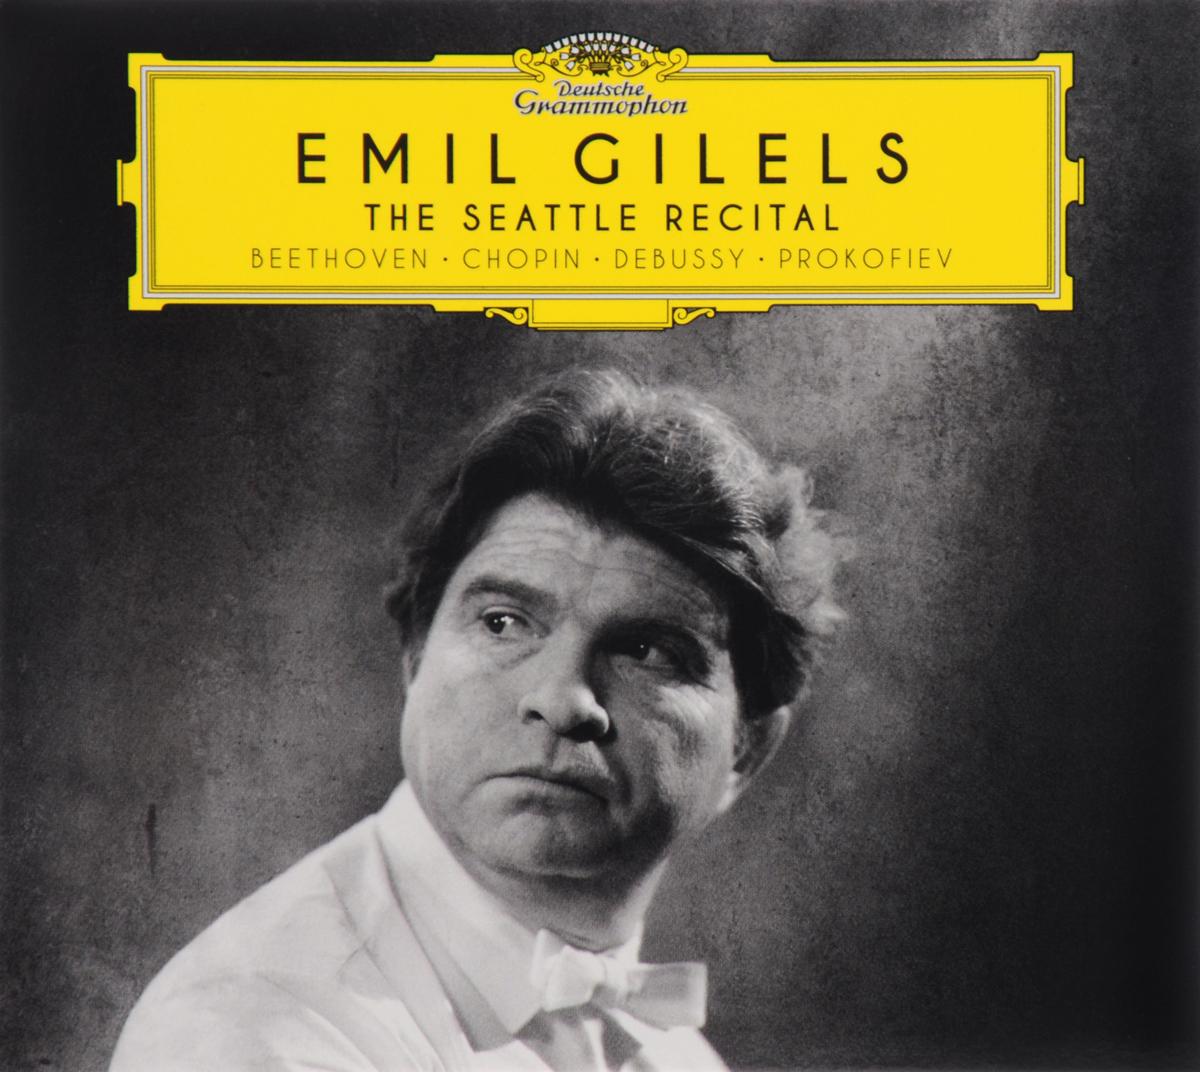 Эмиль Гилельс Emil Gilels. The Seattle Recital эмиль гилельс emil gilels beethoven piano sonatas no 21 23 26